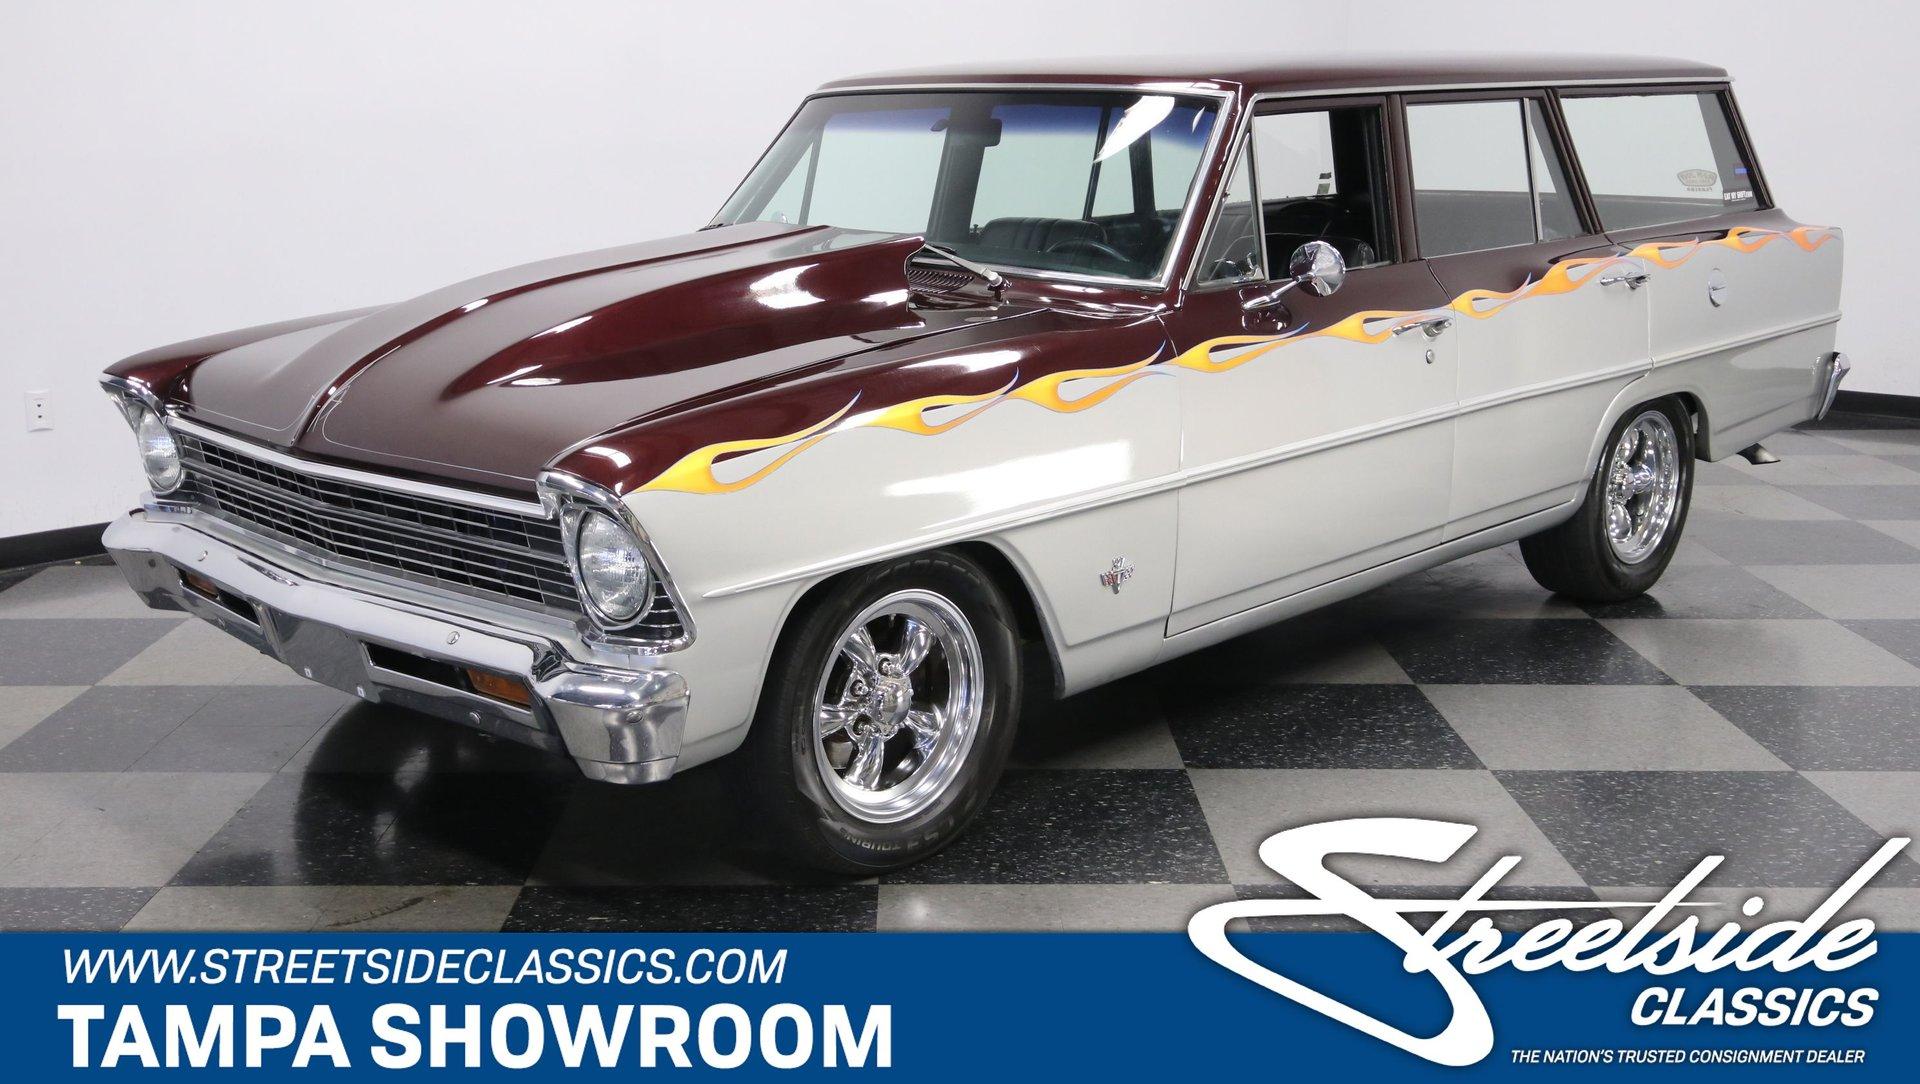 1967 Chevrolet Nova Classic Cars For Sale Streetside Classics The Nation S 1 Consignment Dealer